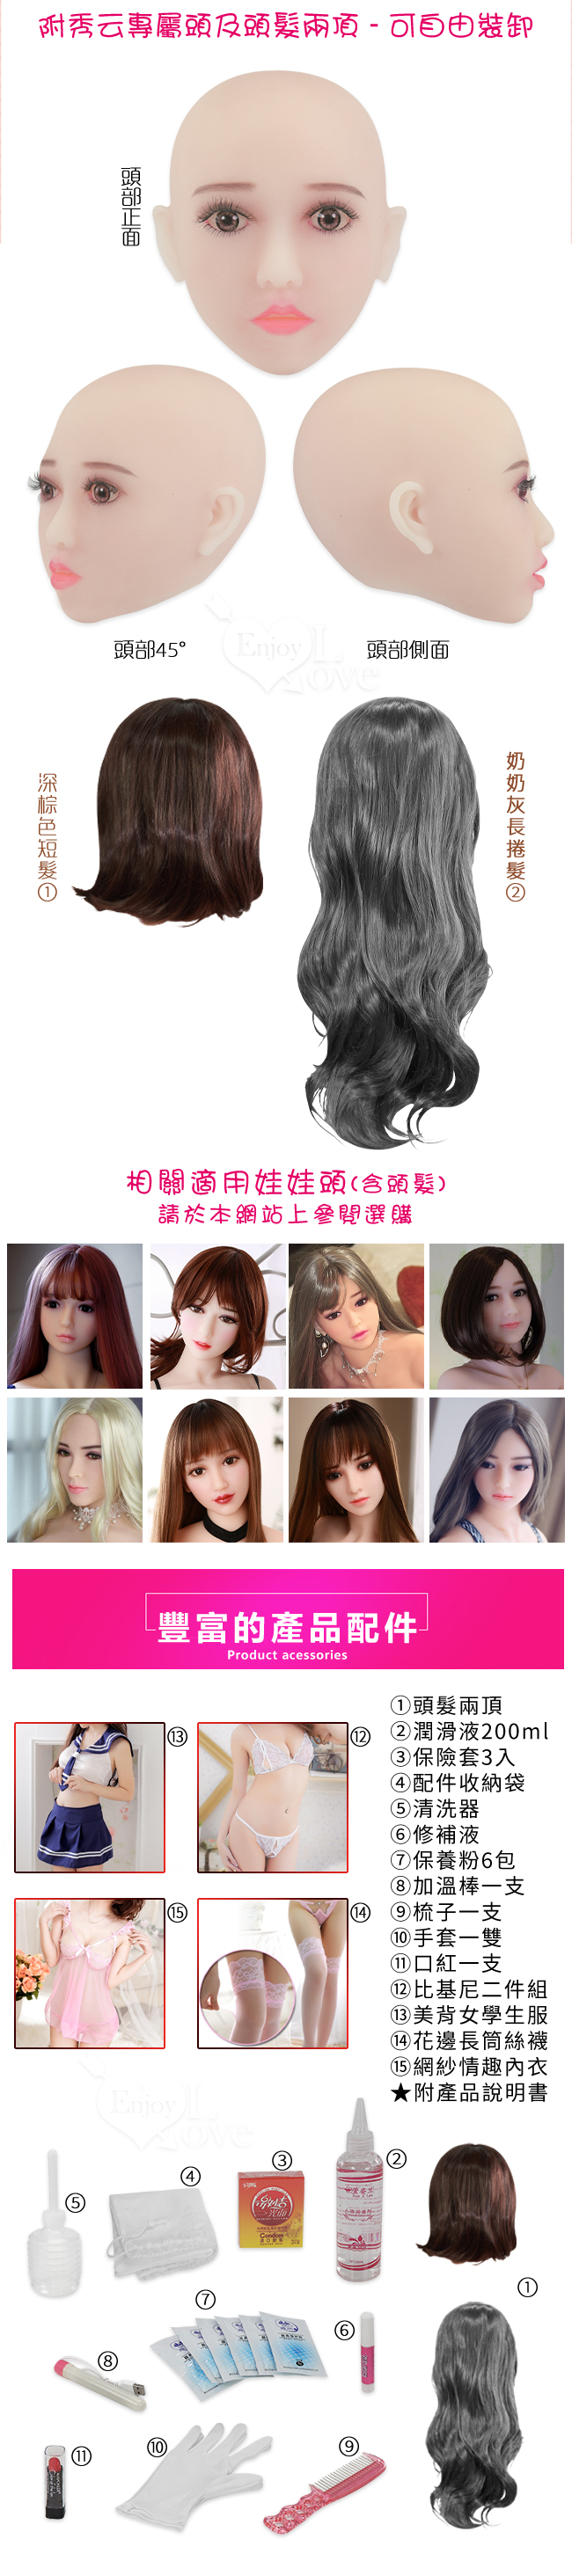 《 Xiuyun 秀云 - 清純美少女 》已長高 / 可站立 實體娃娃﹝148cm / 27kg﹞